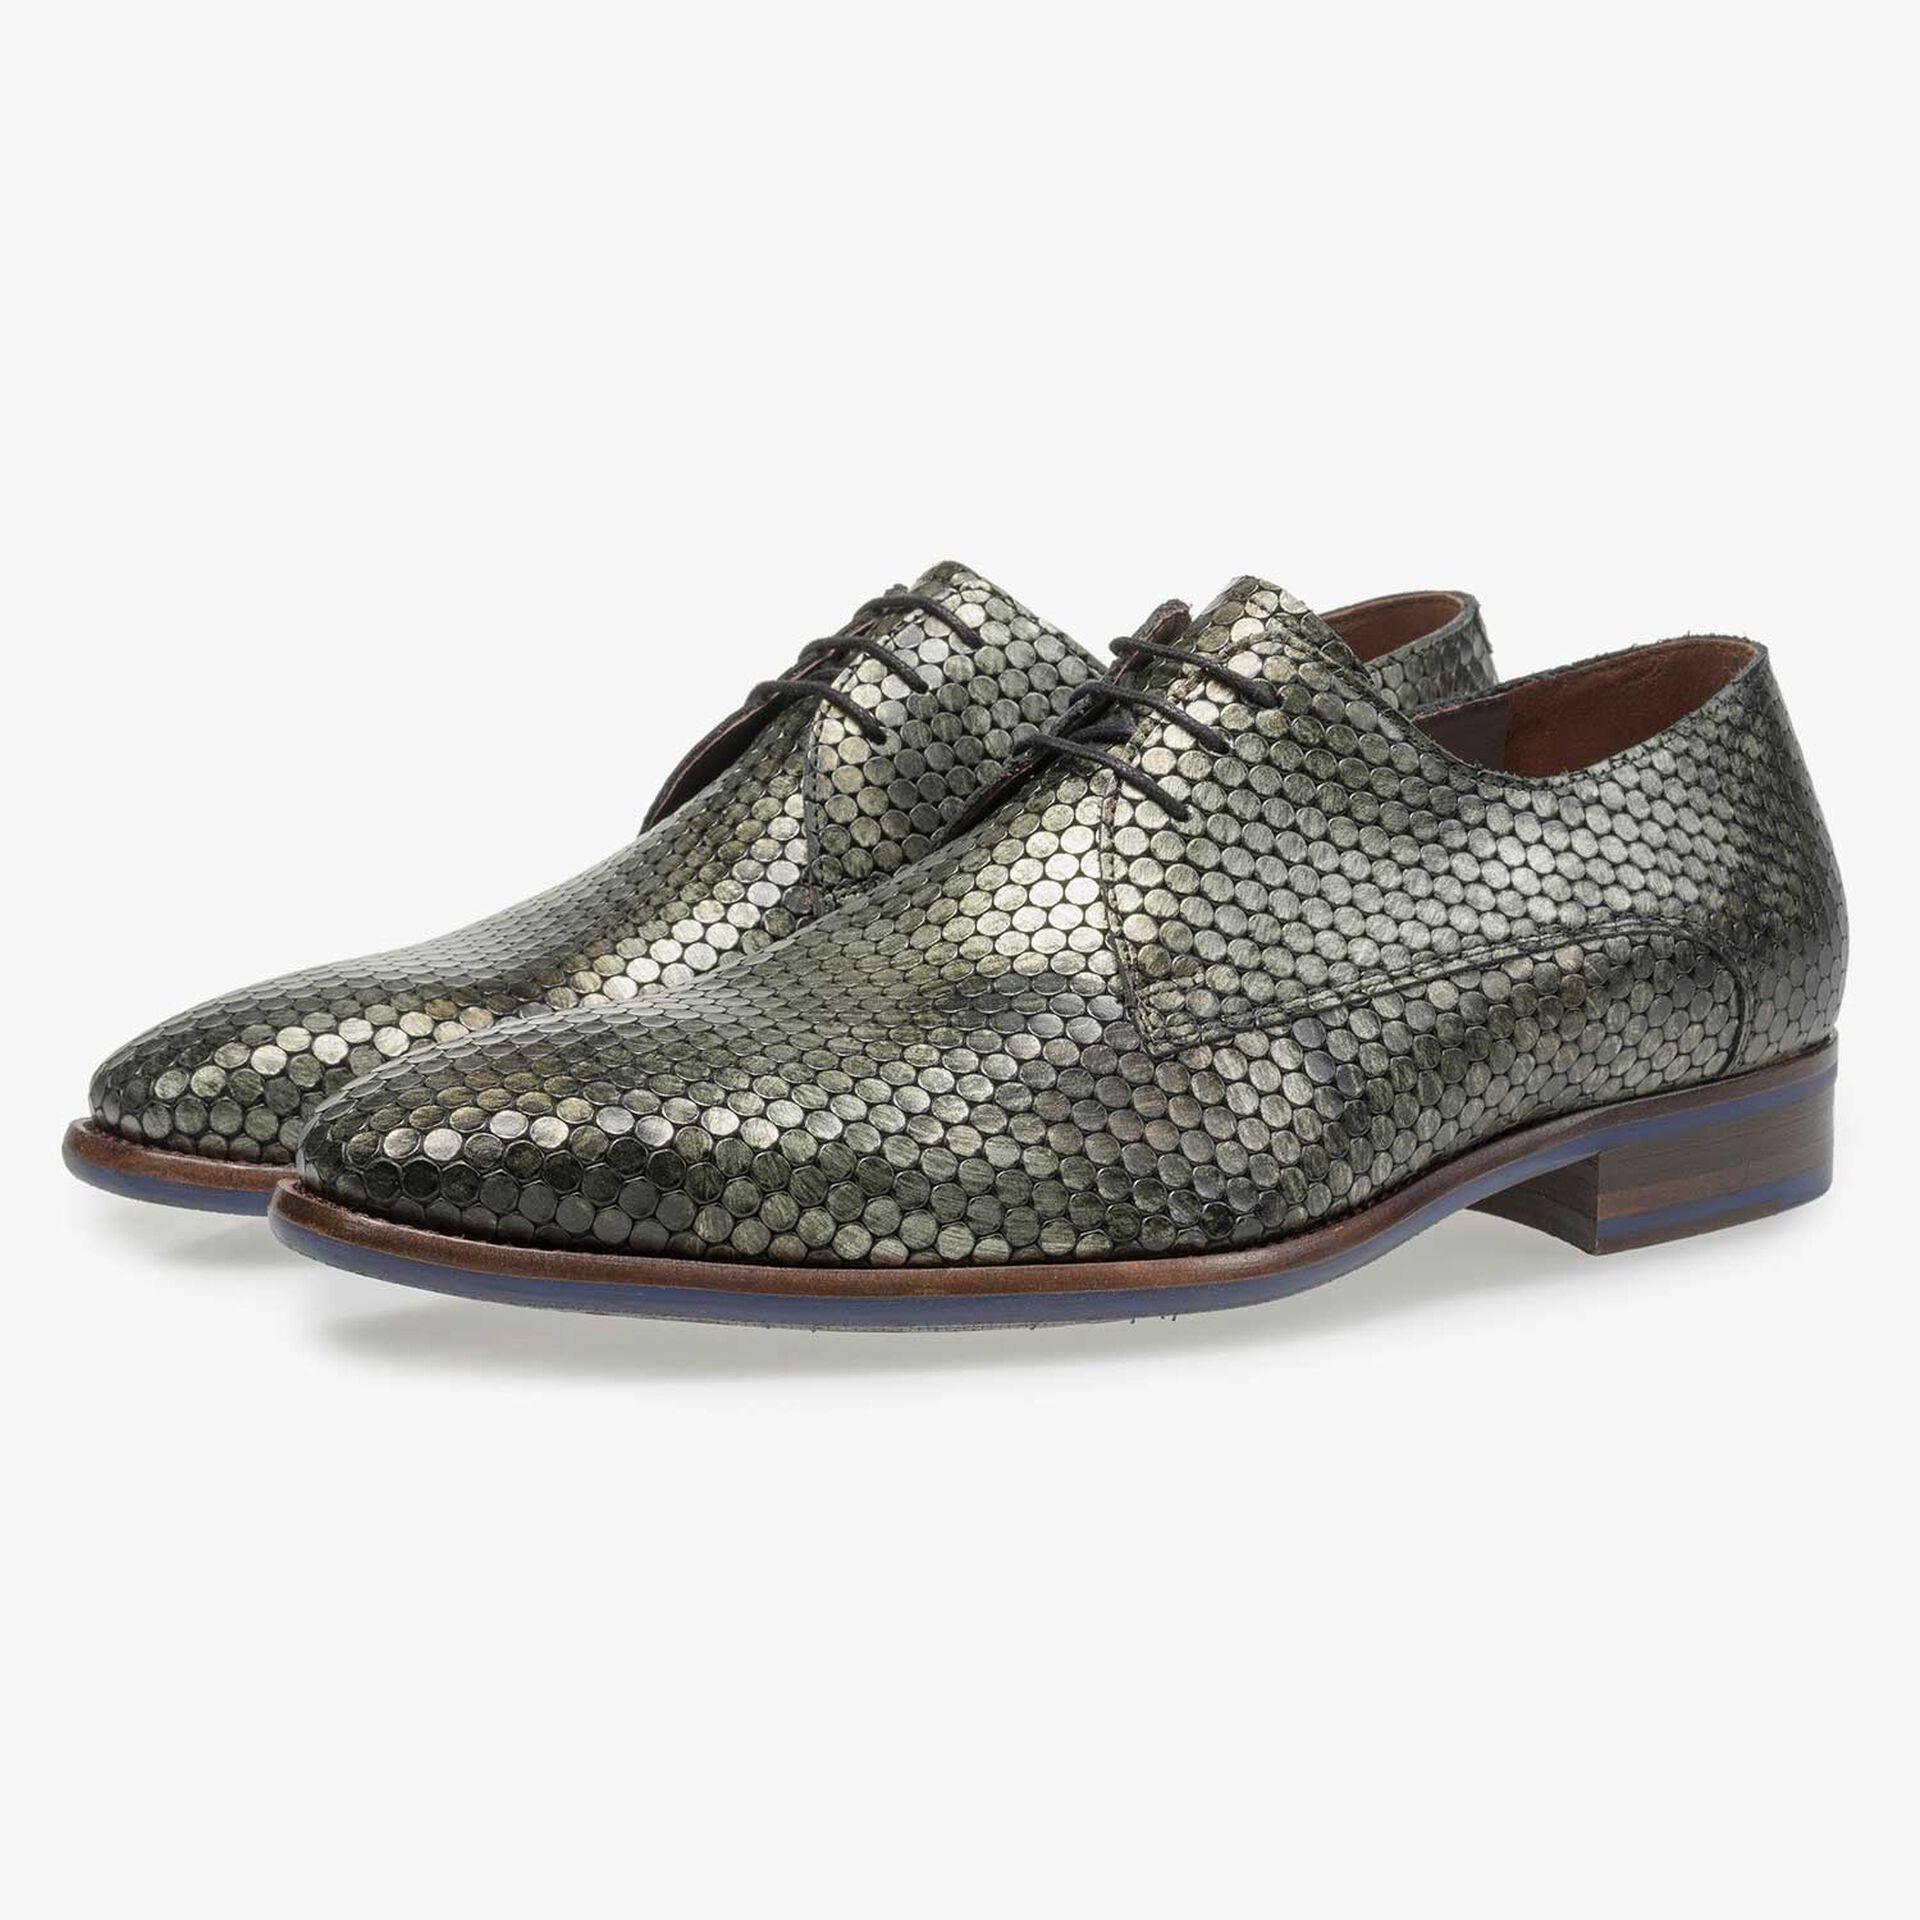 Green metallic print leather lace shoe